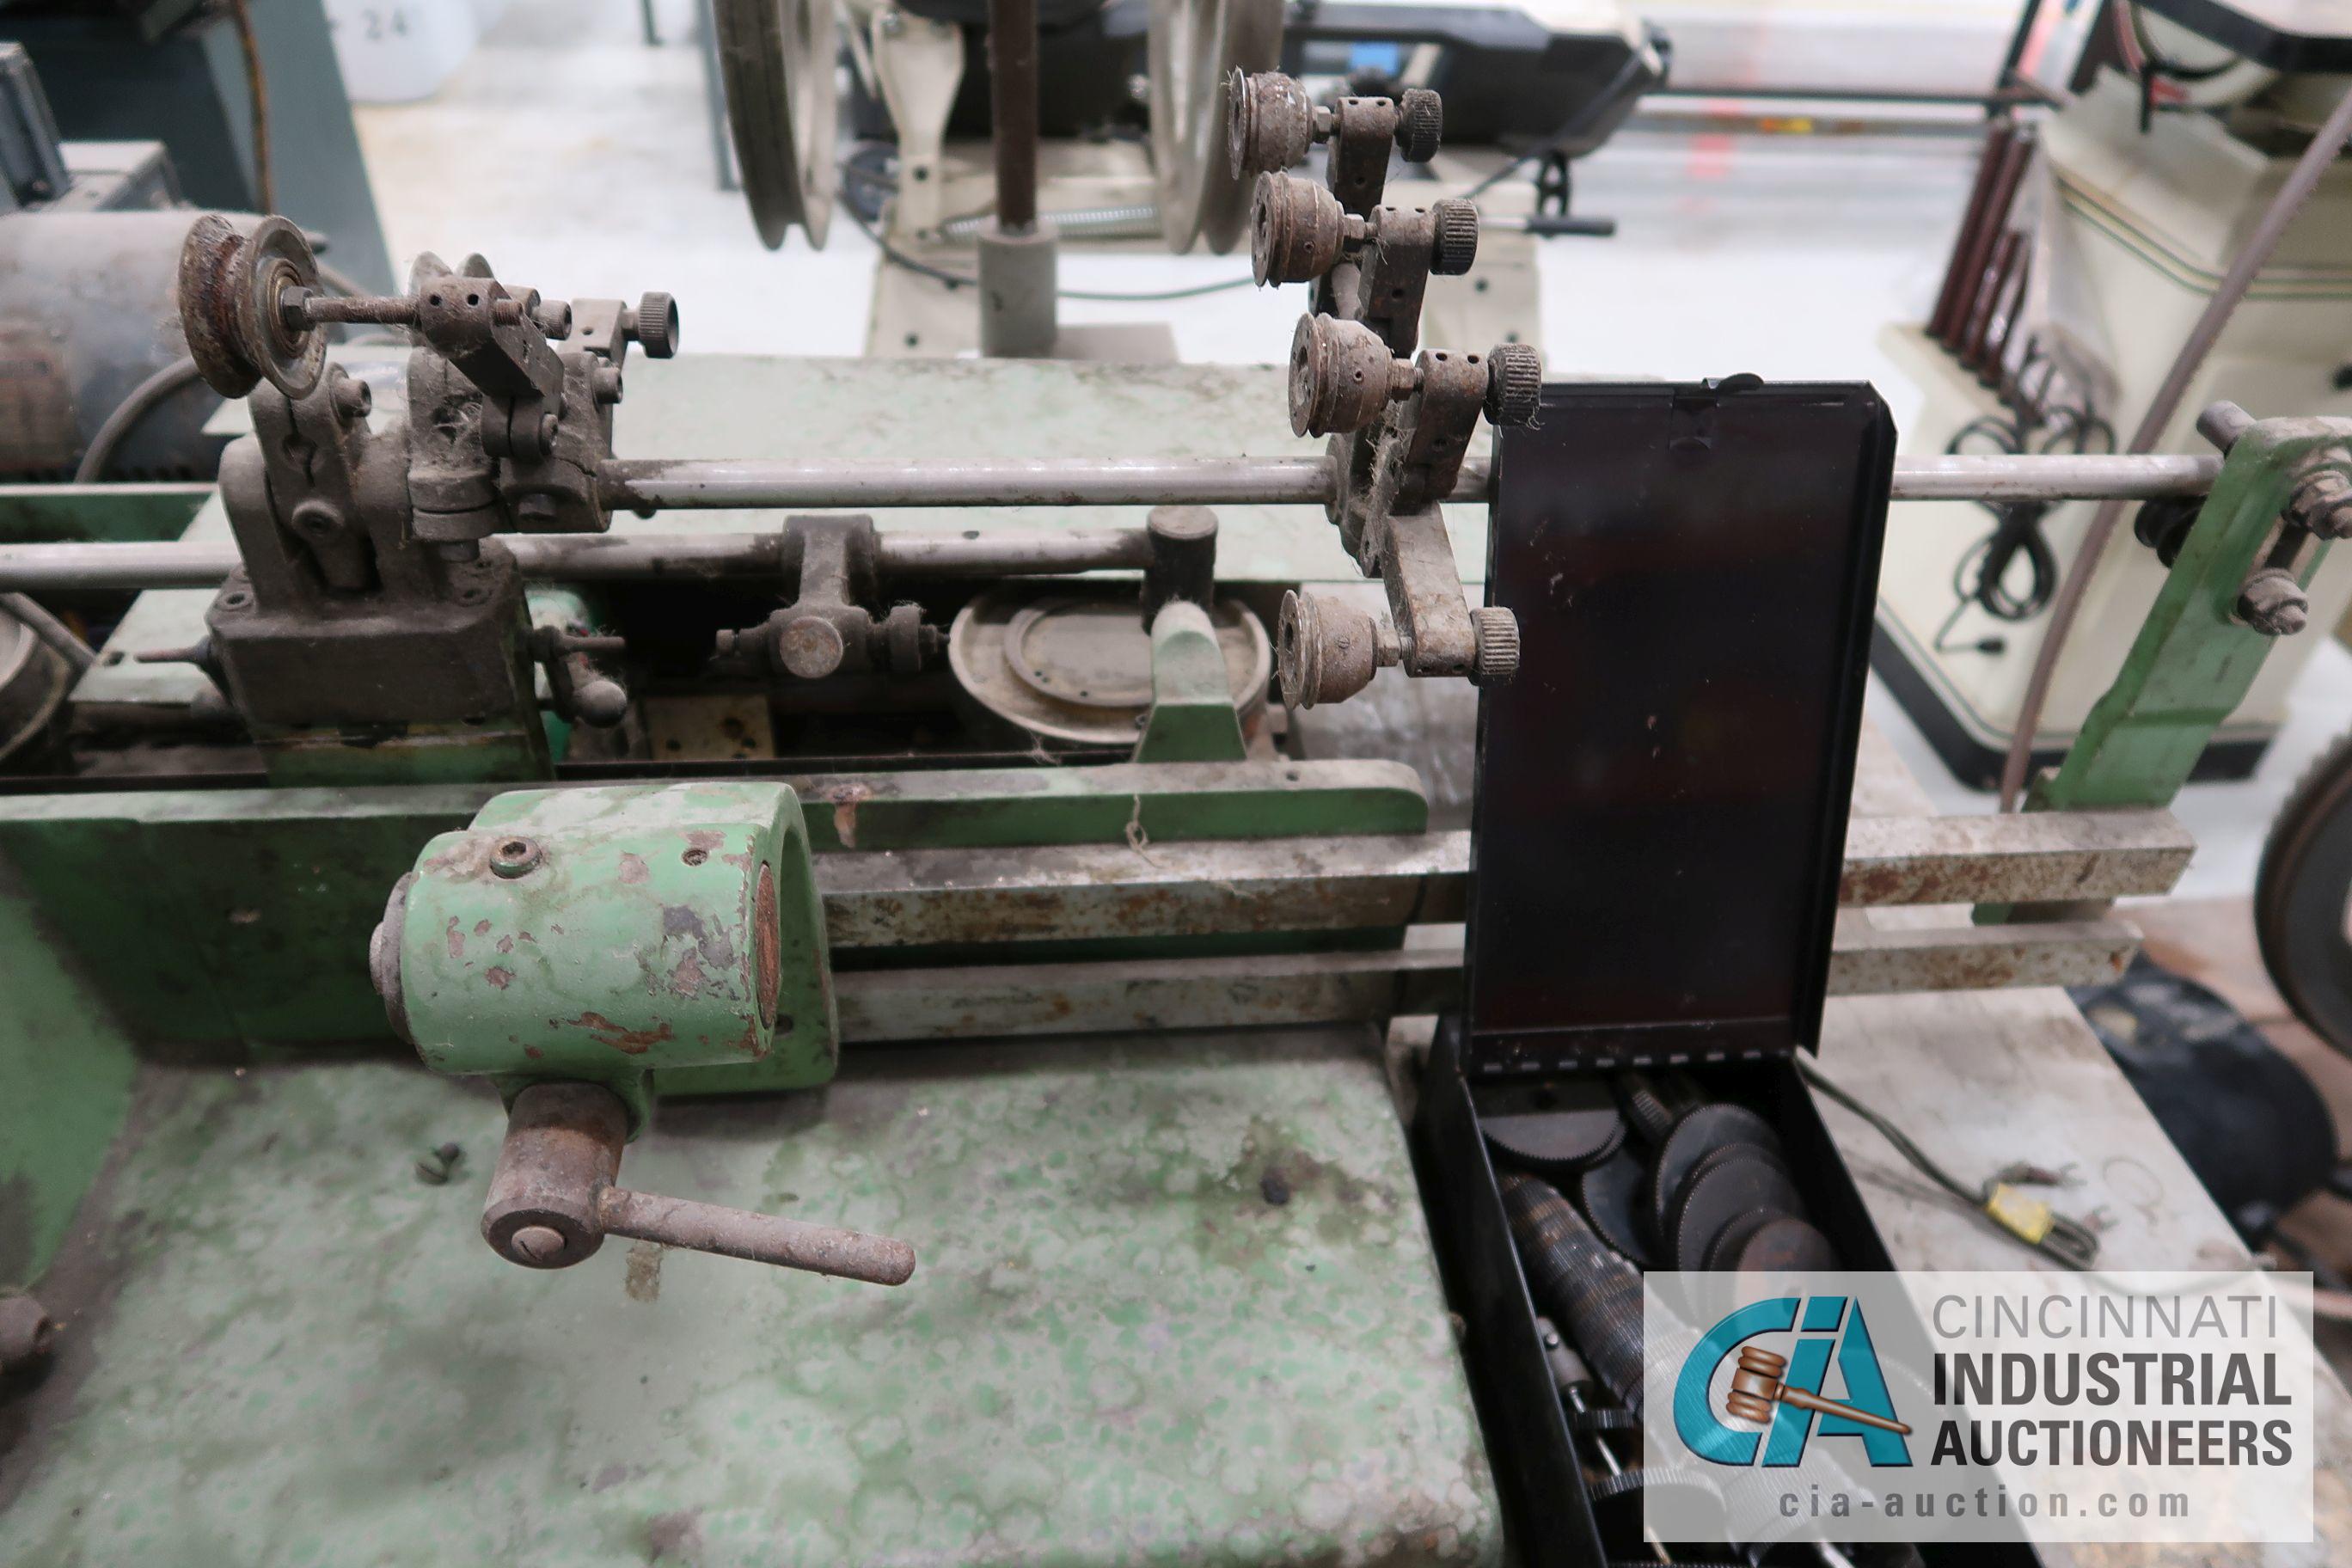 METEOR TYPE ME 301 BOBBIN WINDING MACHINE; S/N 9844 - Image 5 of 5